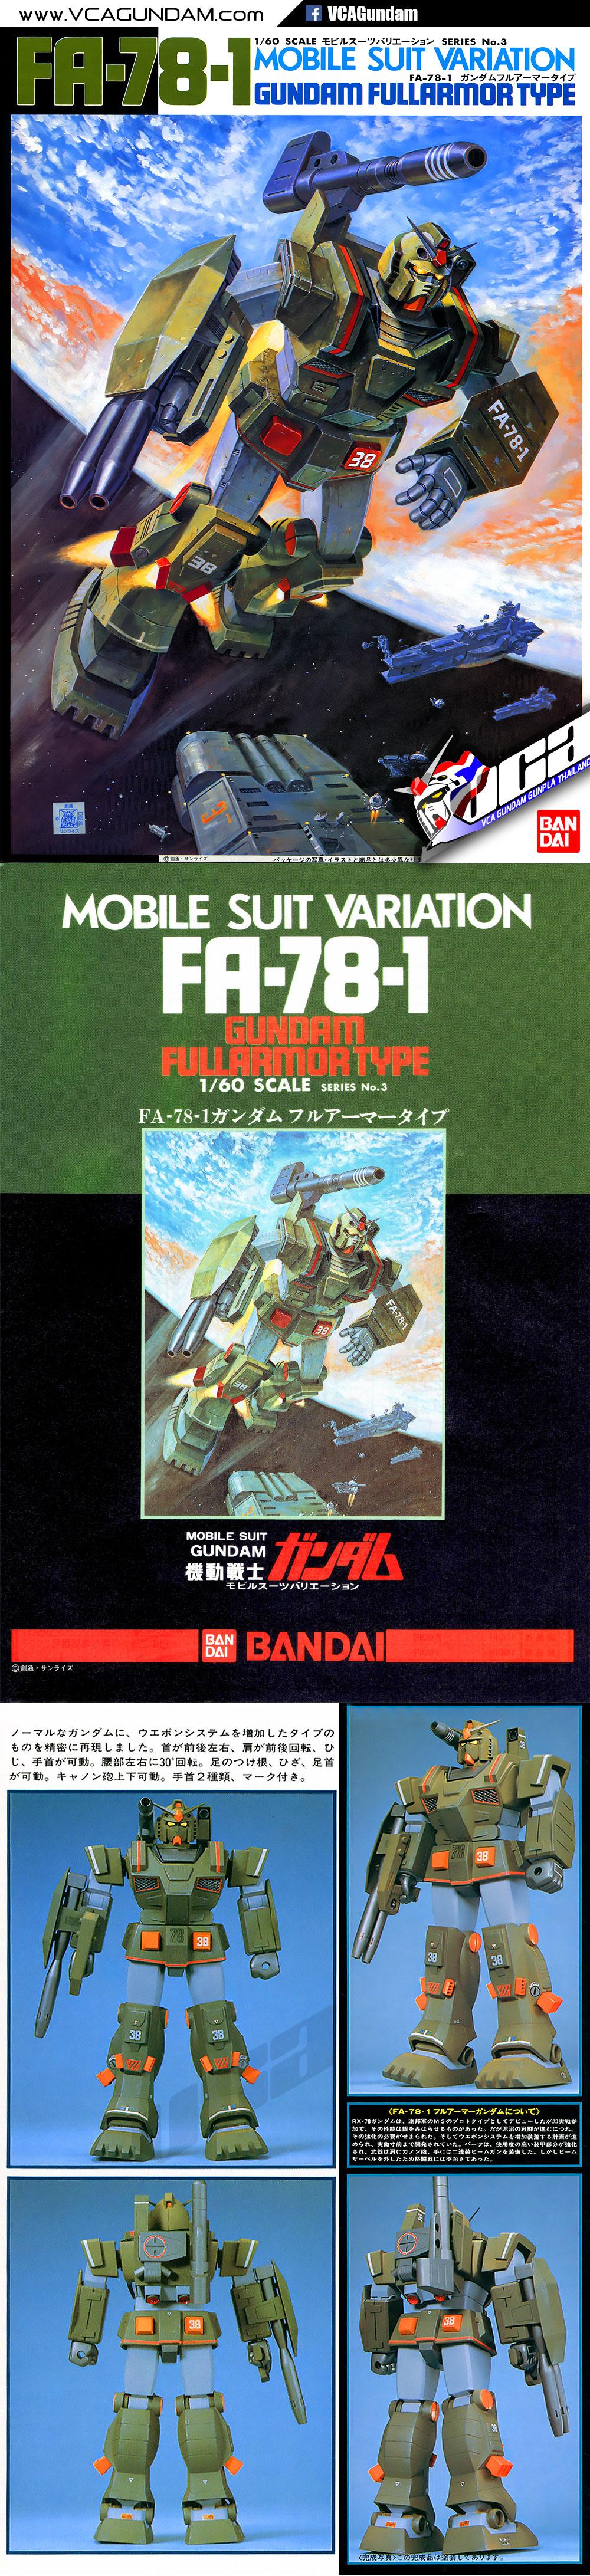 CLASSIC 1/60 FA-78-1 GUNDAM FULLARMOR TYPE กันดั้ม ฟูลอาเมอร์ ไทป์